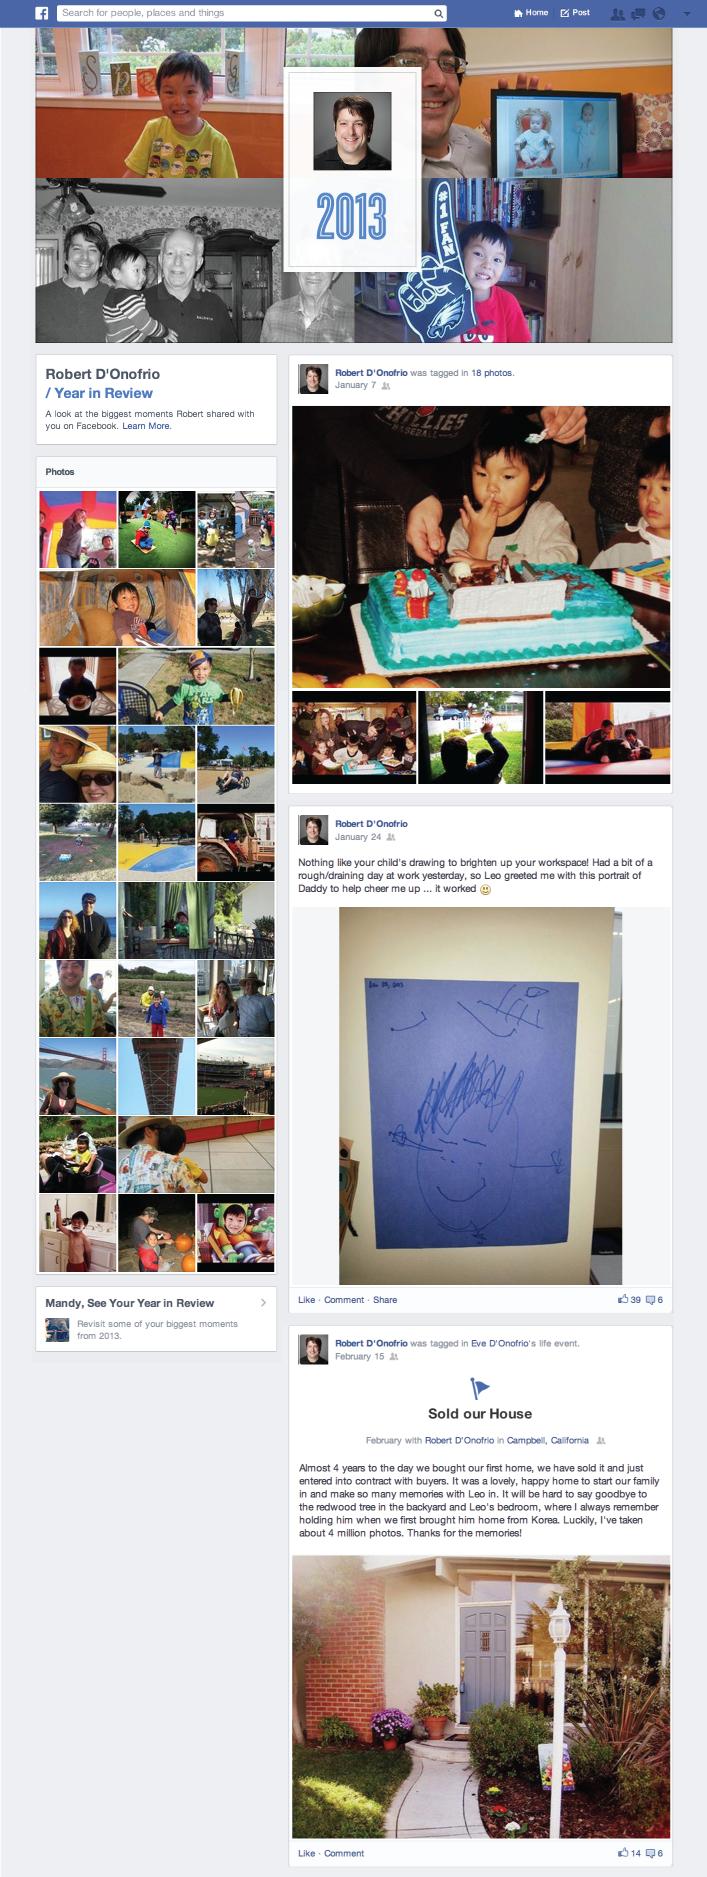 resumen 2013 facebook